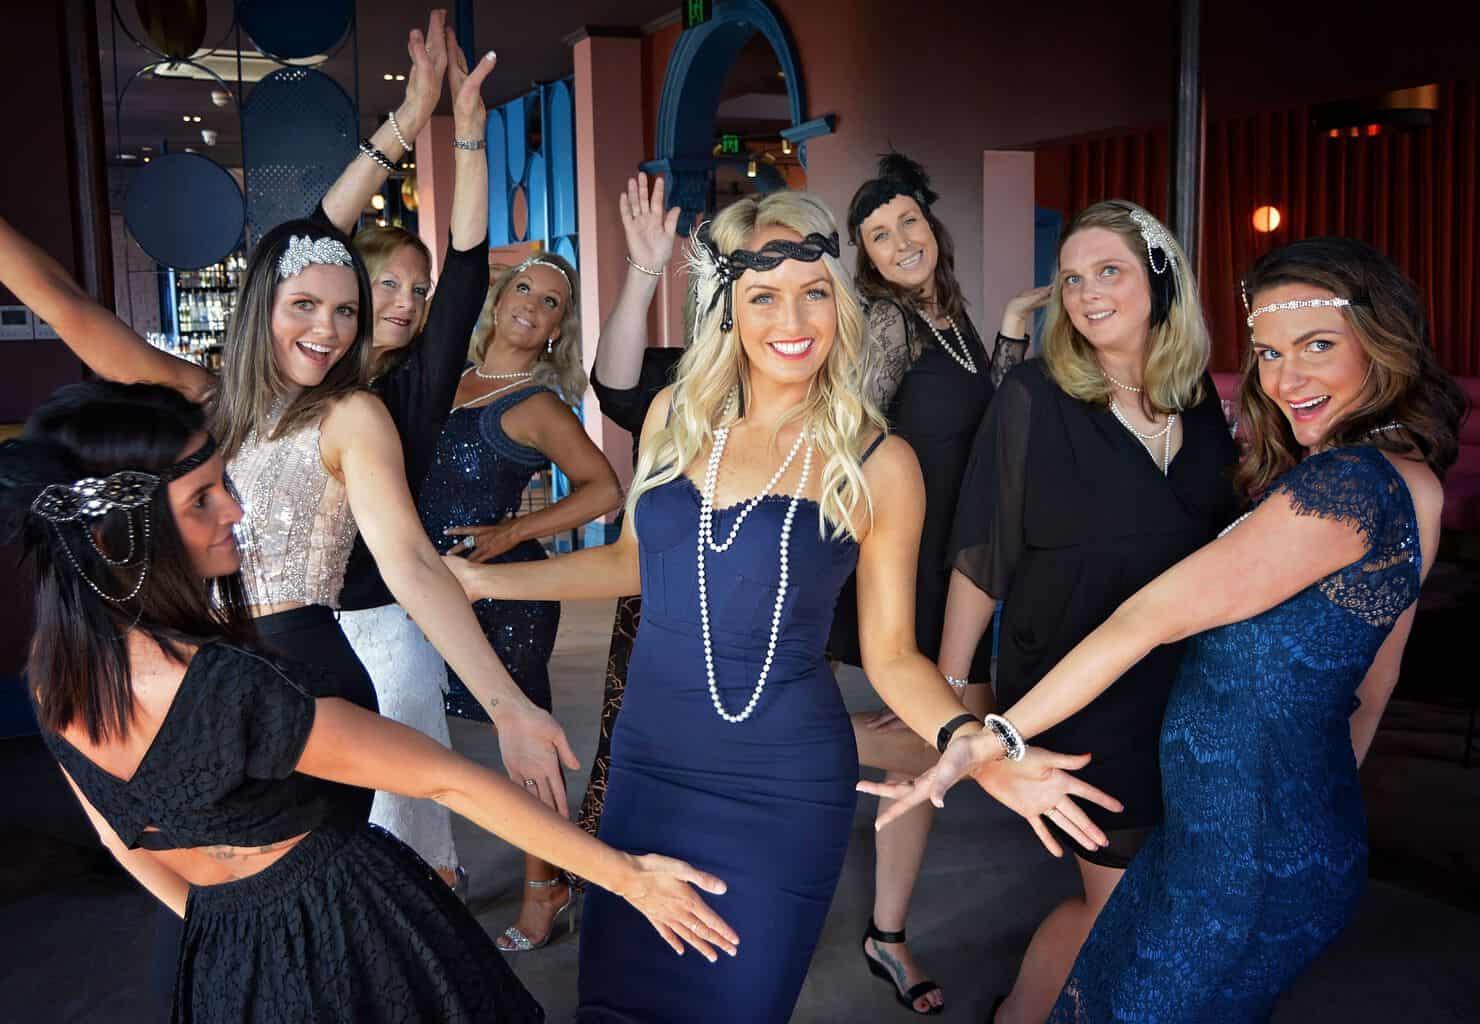 Women/'s Let The Good Times Be Gin Fancy Dress Bottle Costume Hen Theme Night Do